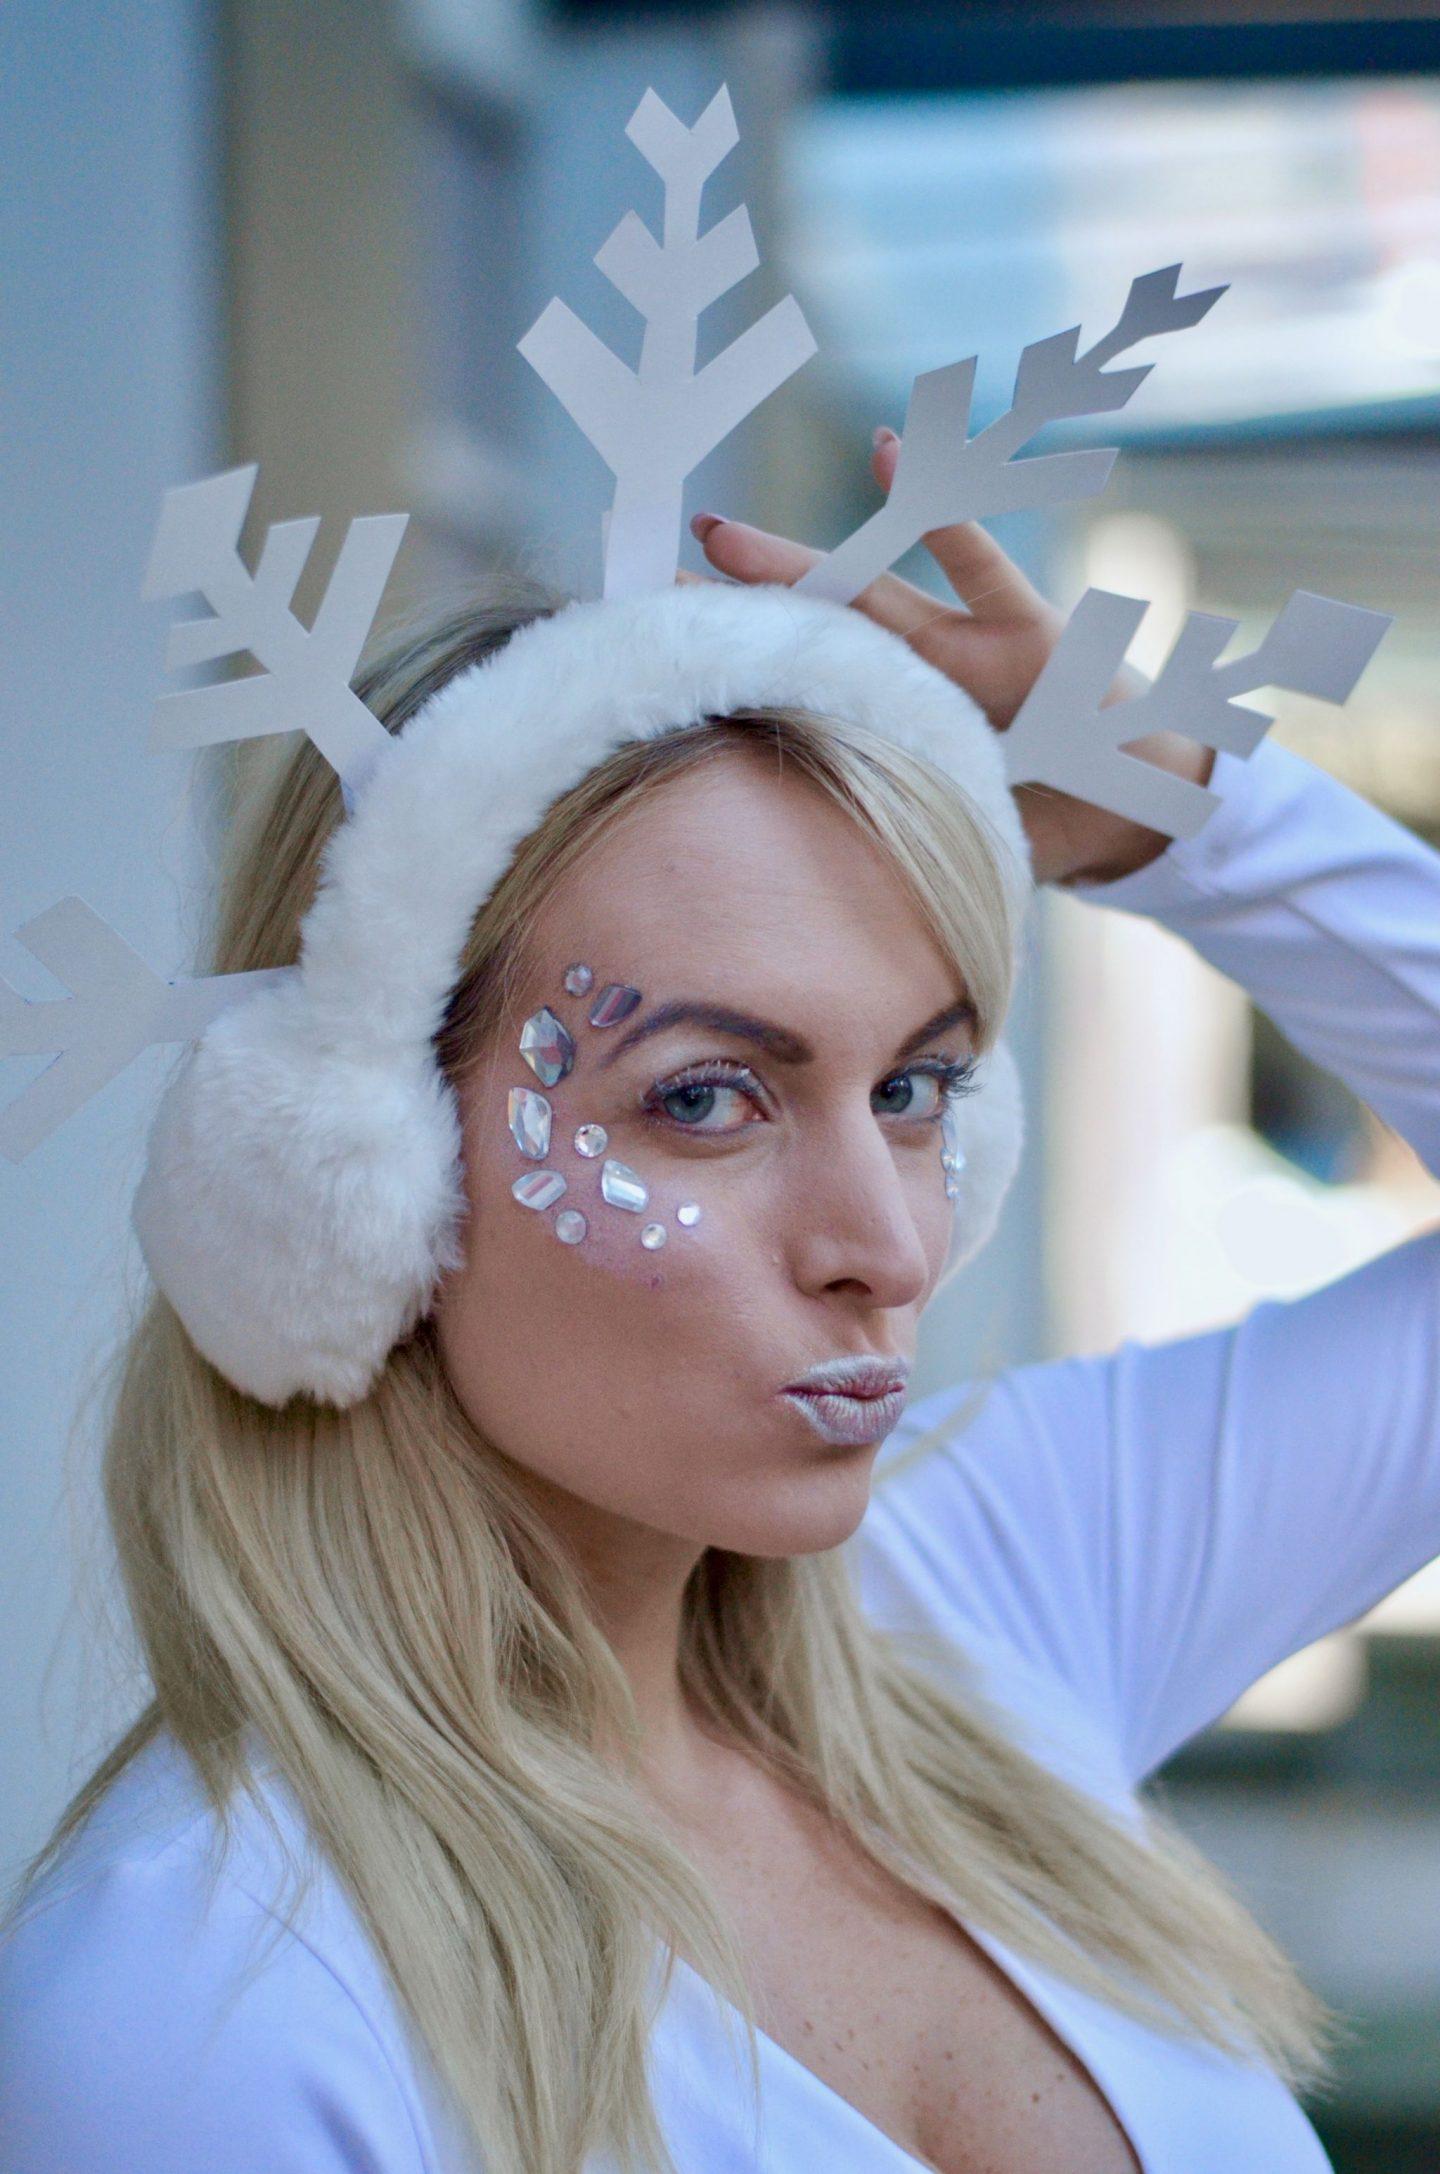 halloween costume idea a liberal snowflake